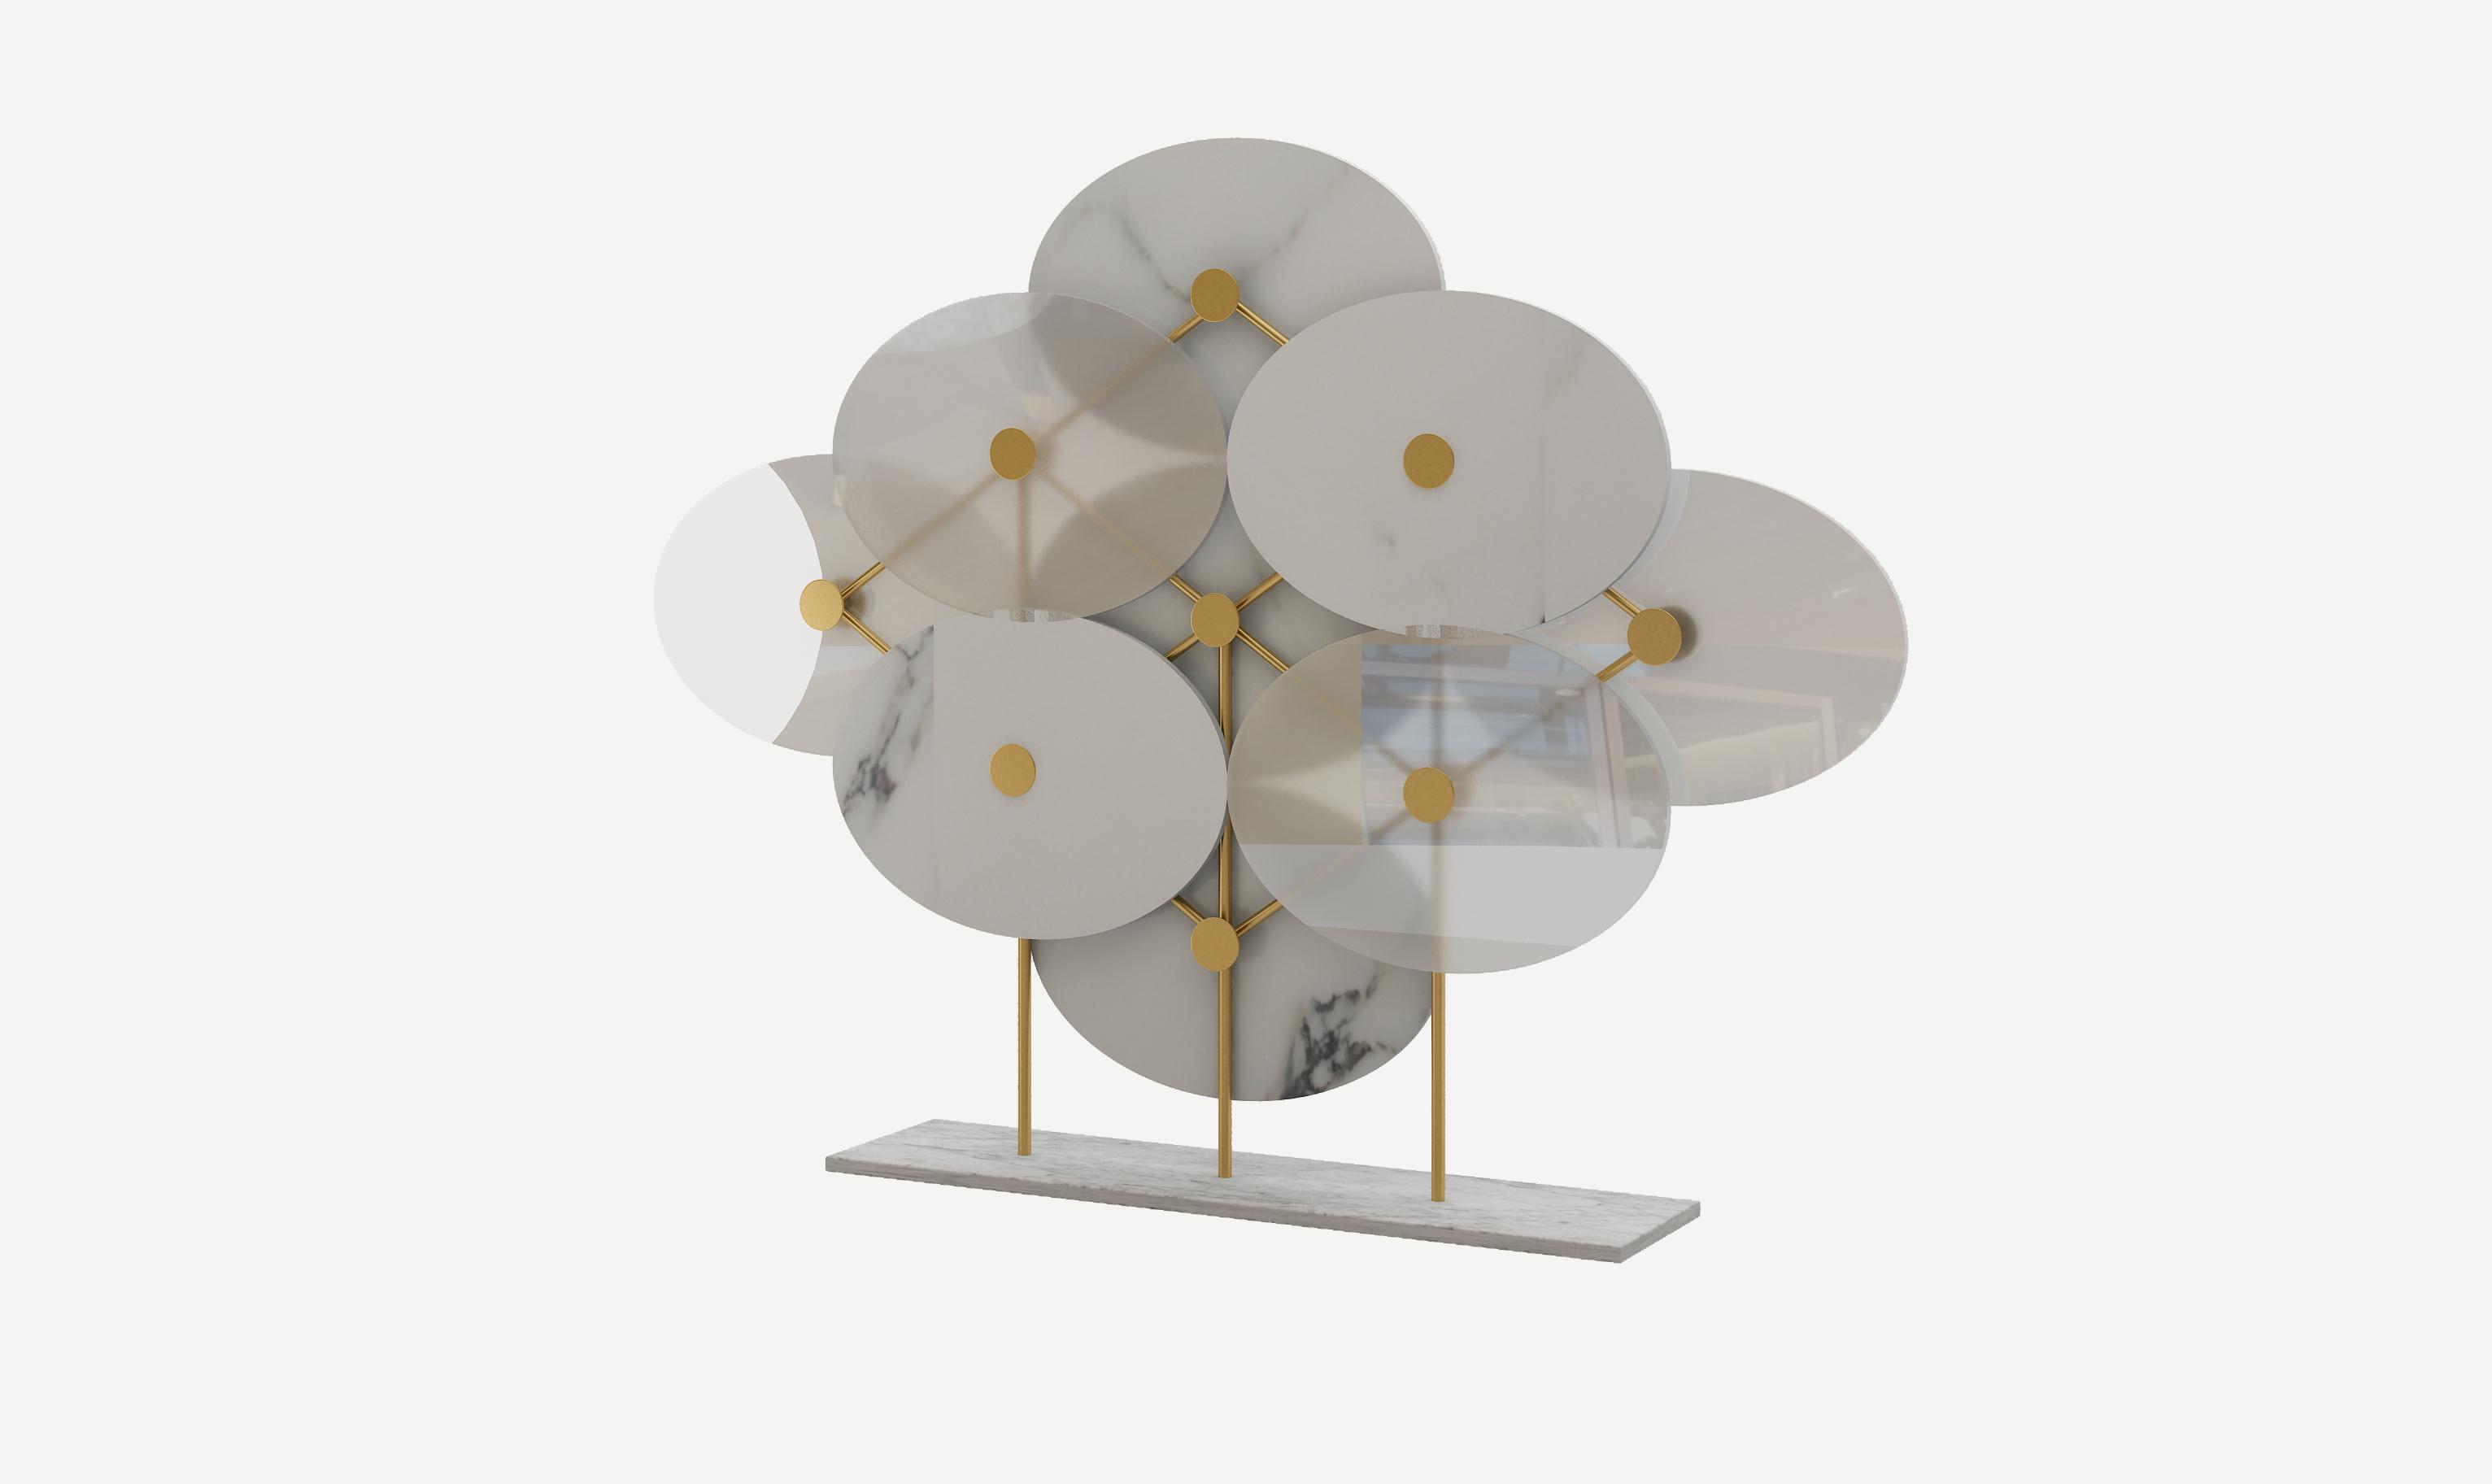 DesignMVW_XuMing&VirginieMoriette_YunMarble_collectiblesHall